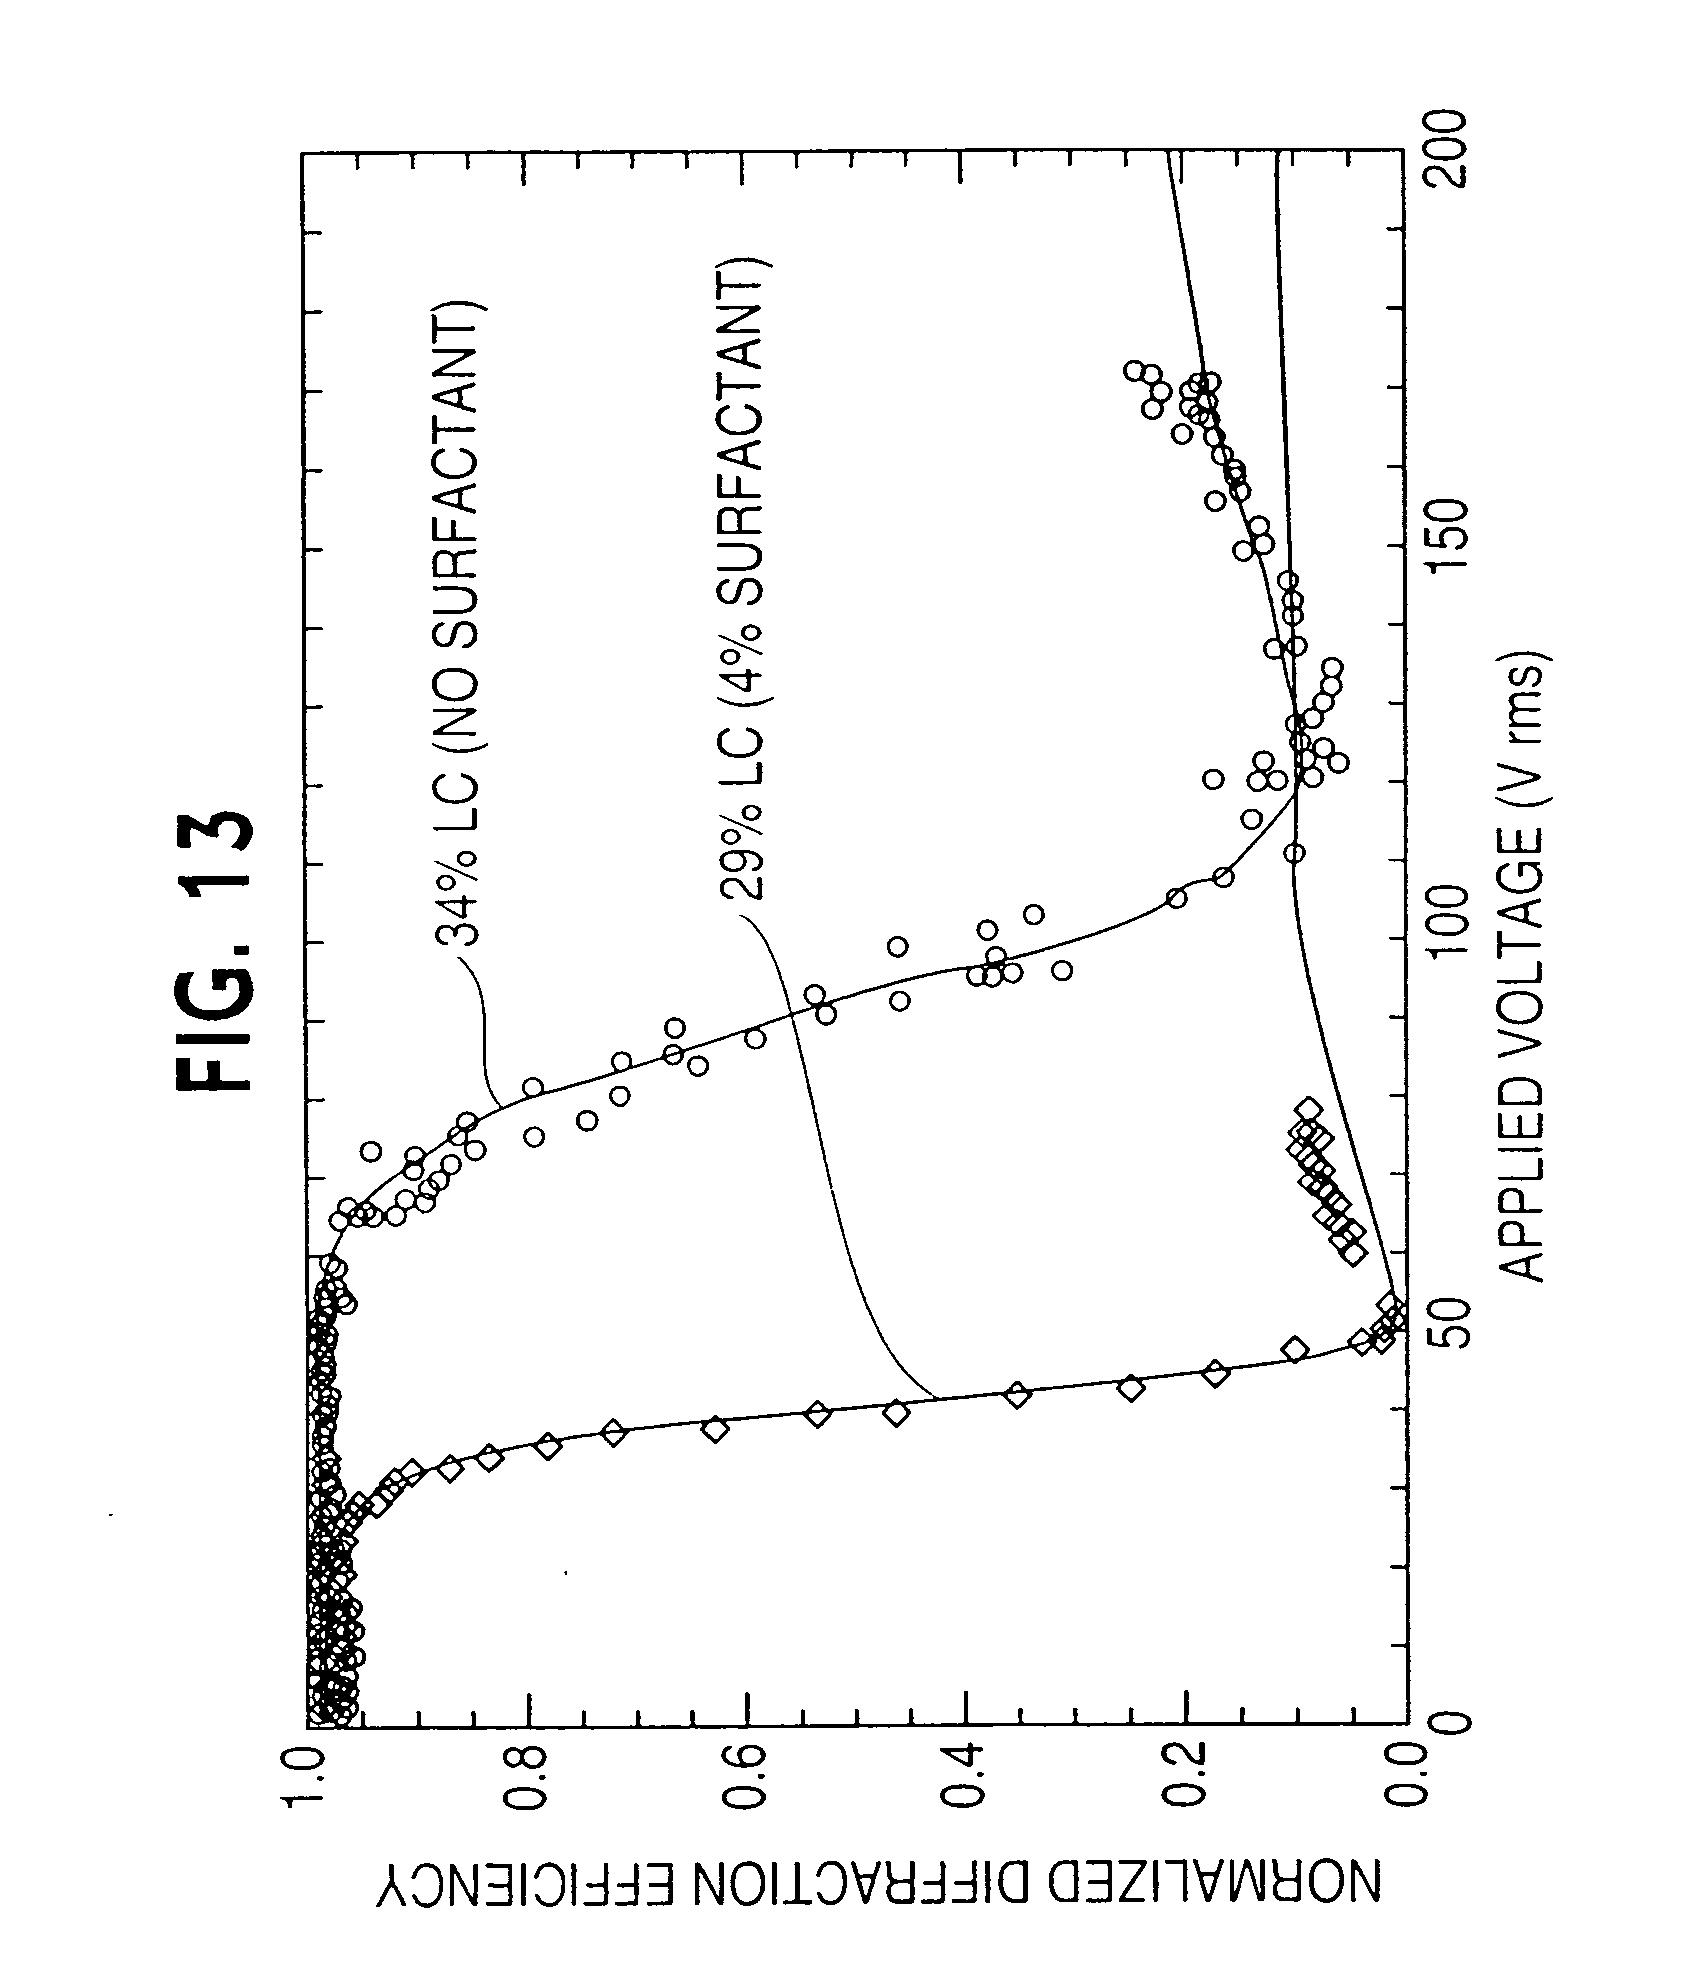 patente us20060119914